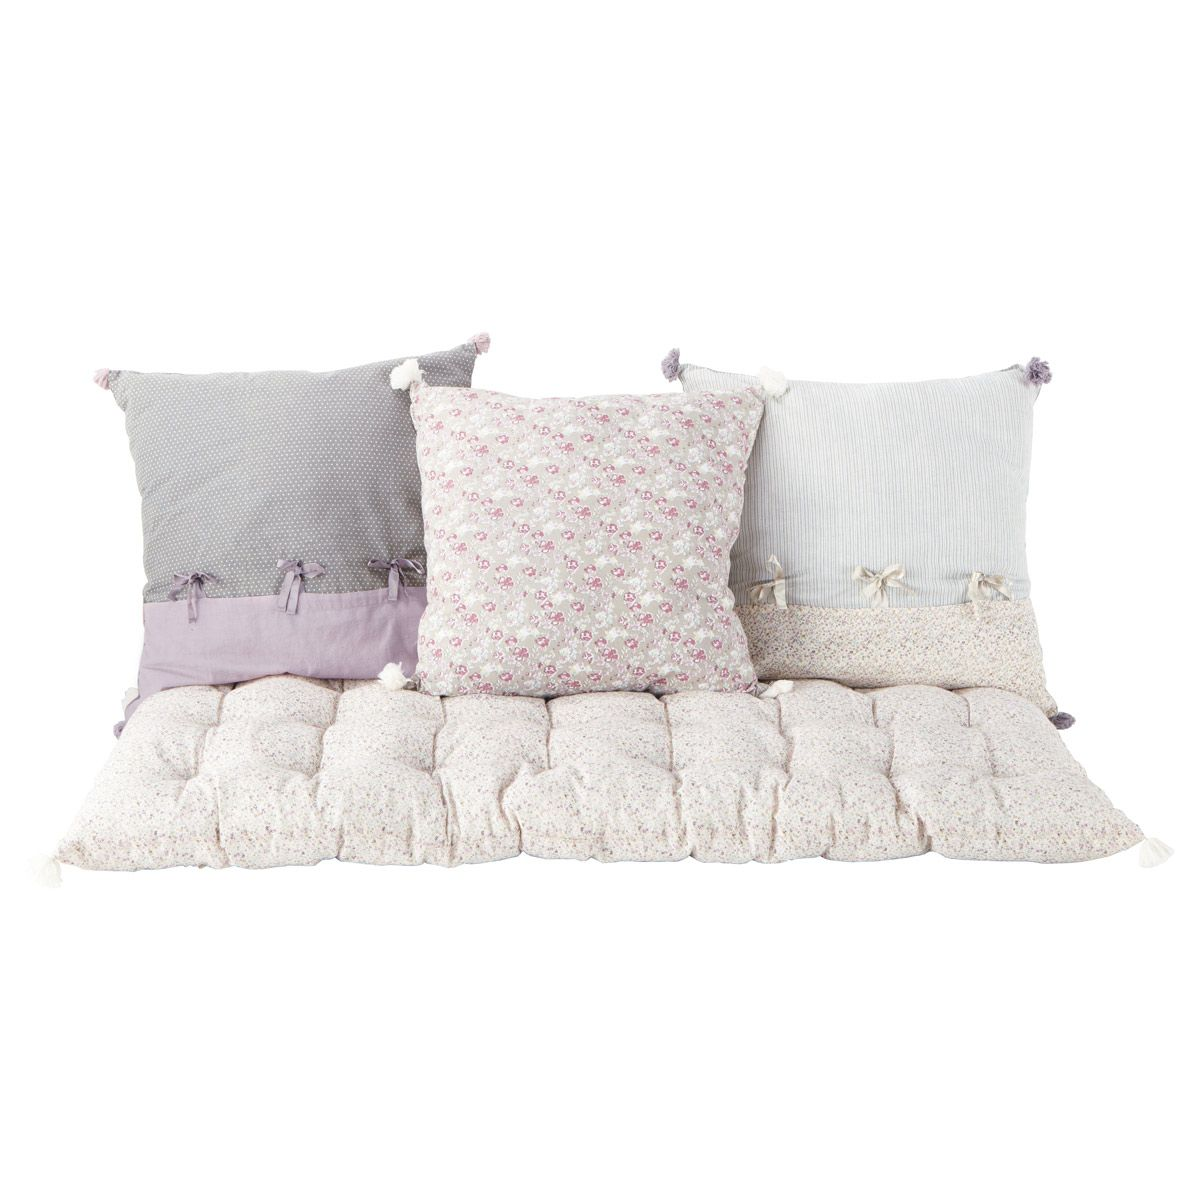 Set de 3 cojines y colchón PIMPRENELLE